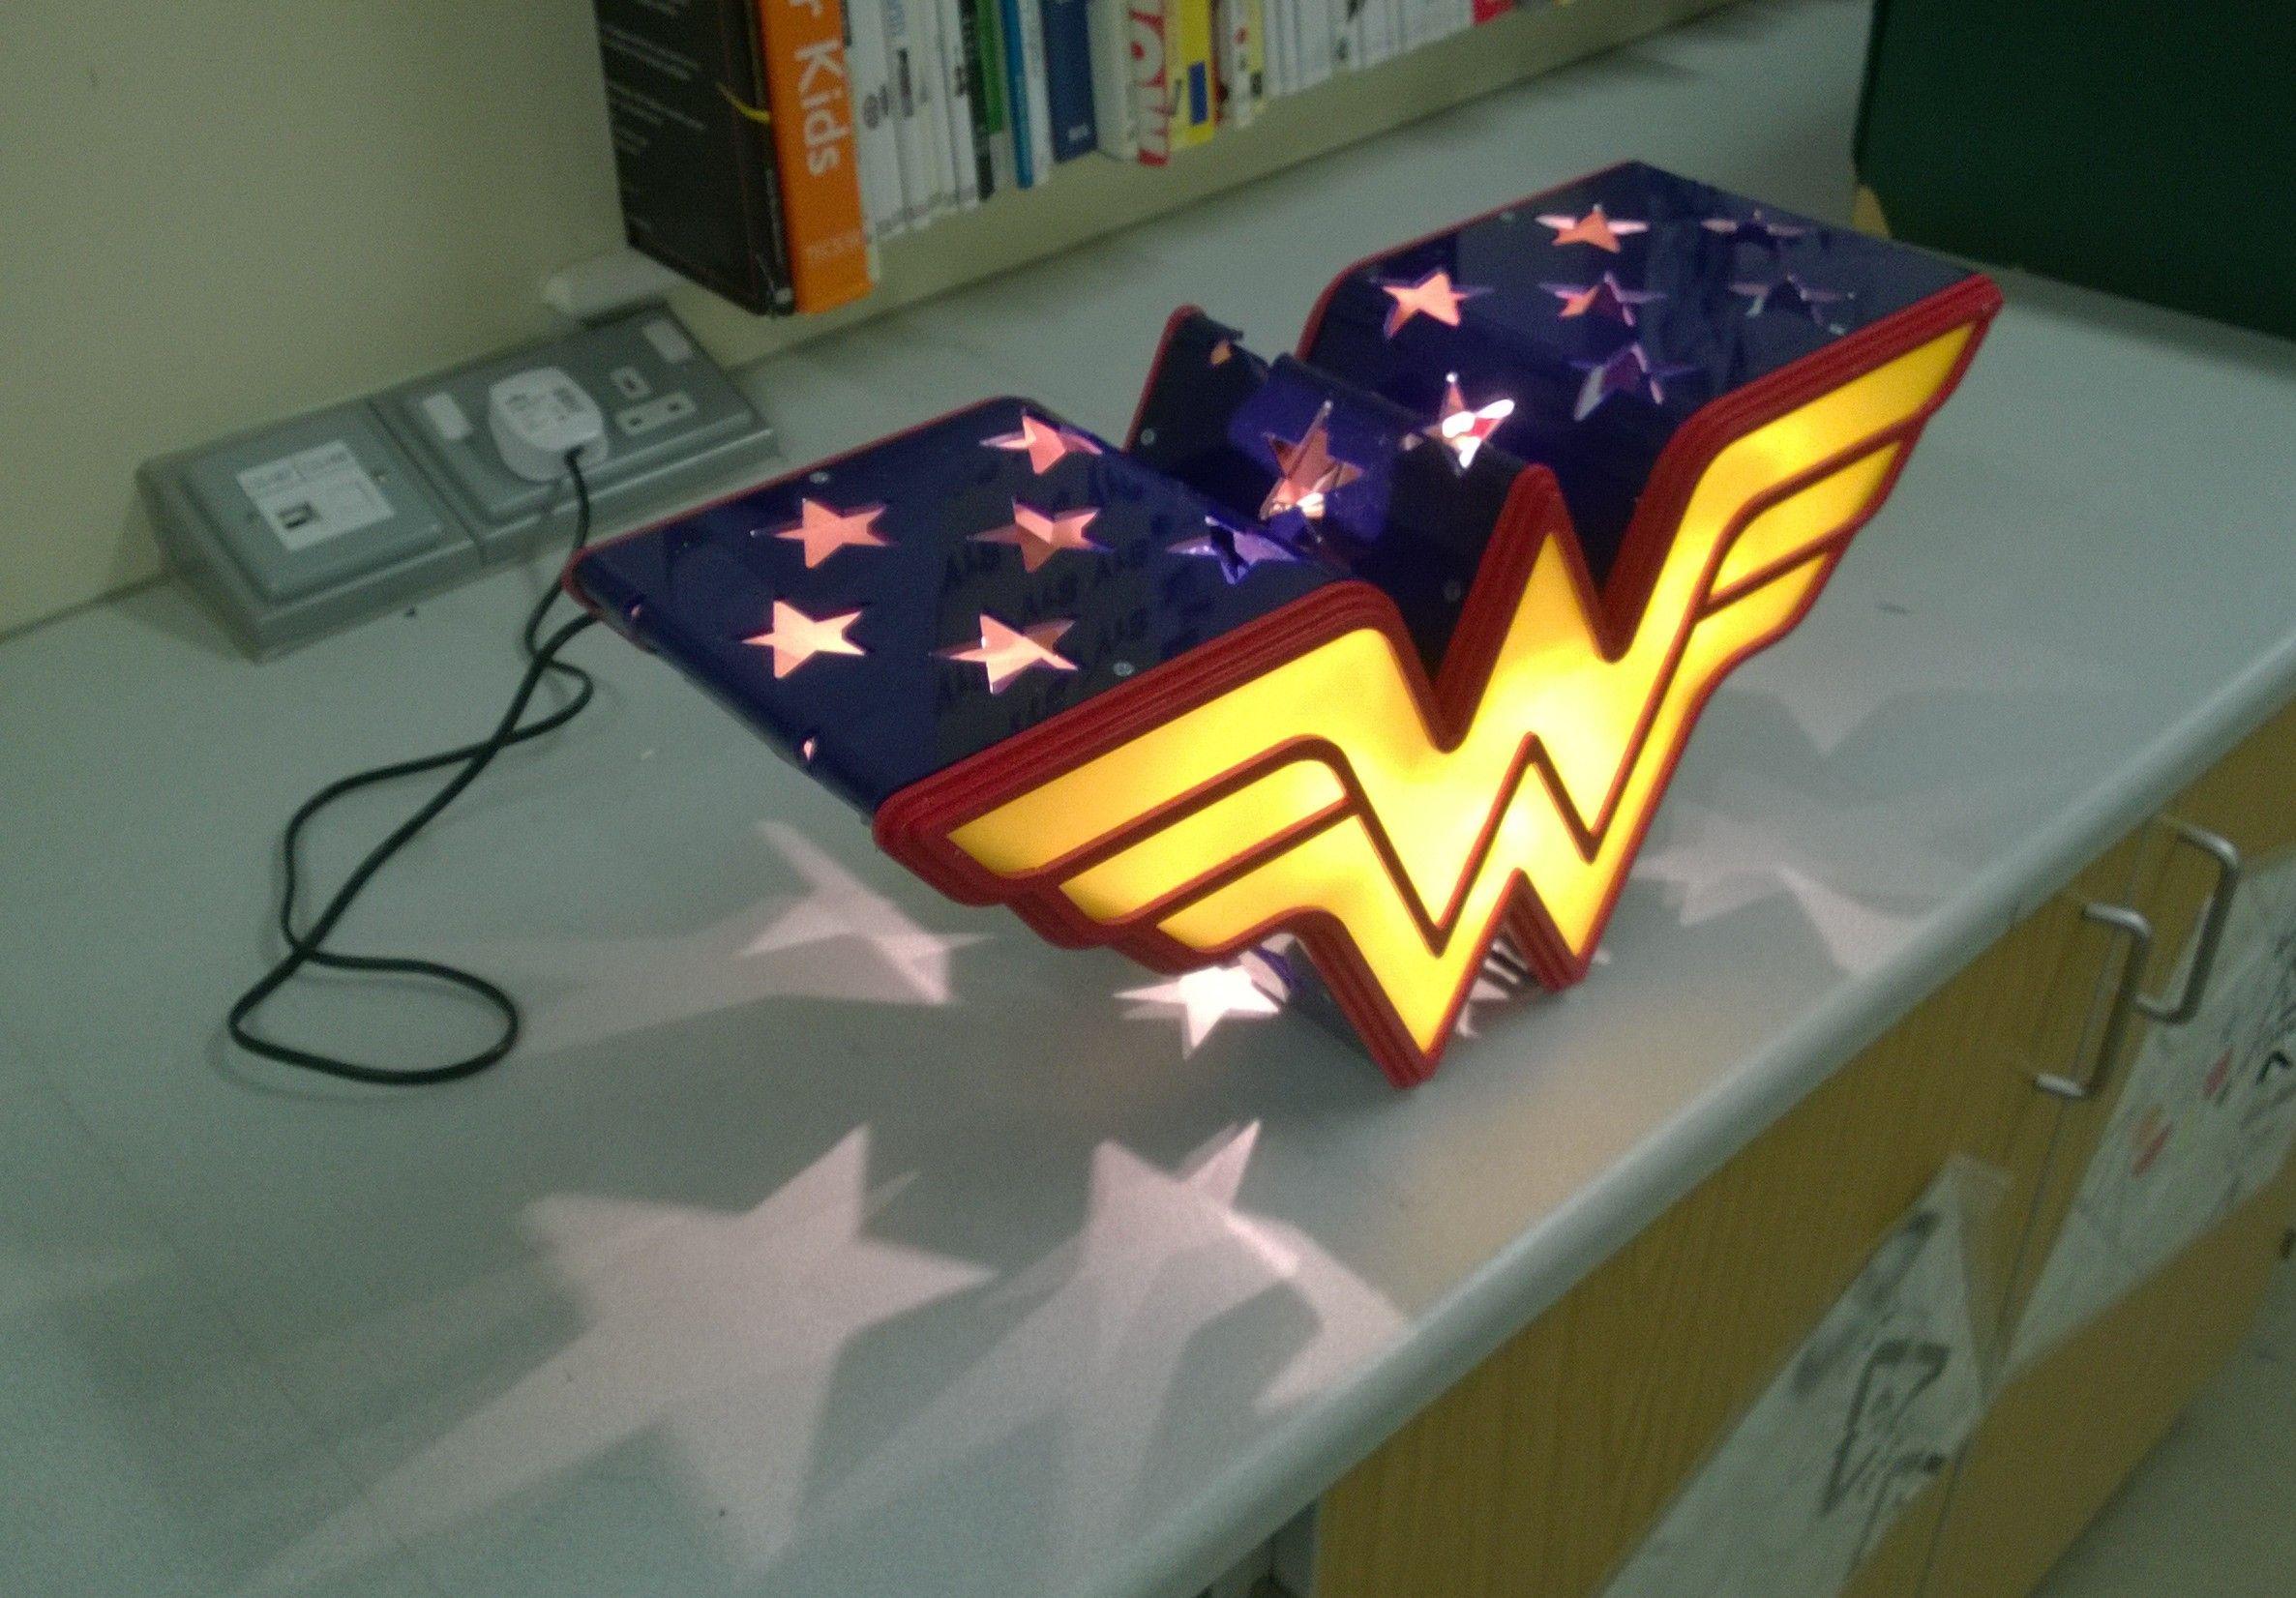 Marvel Wonder Woman Light Lamp Home Decor That I Love